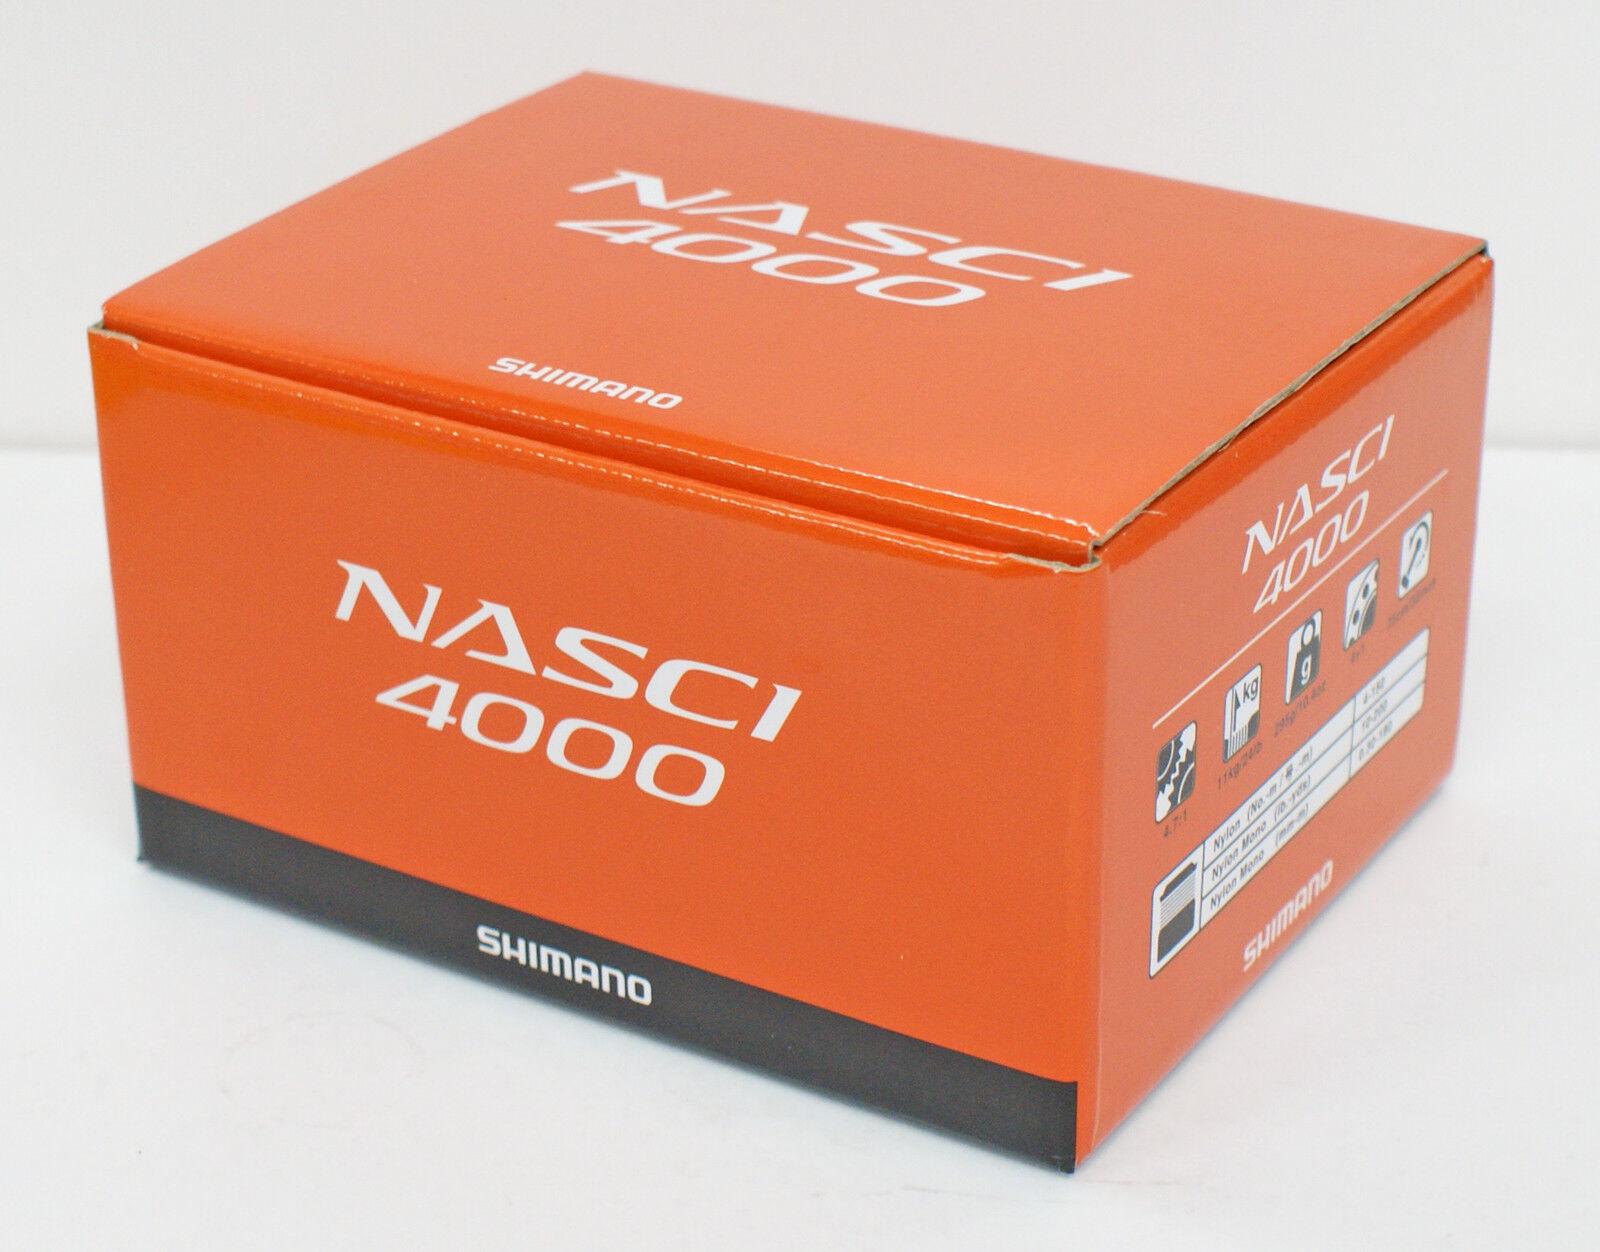 Shimano 16 Nasci 4000 Spinnen Rolle 4969363035752 4969363035752 Rolle 2f805b